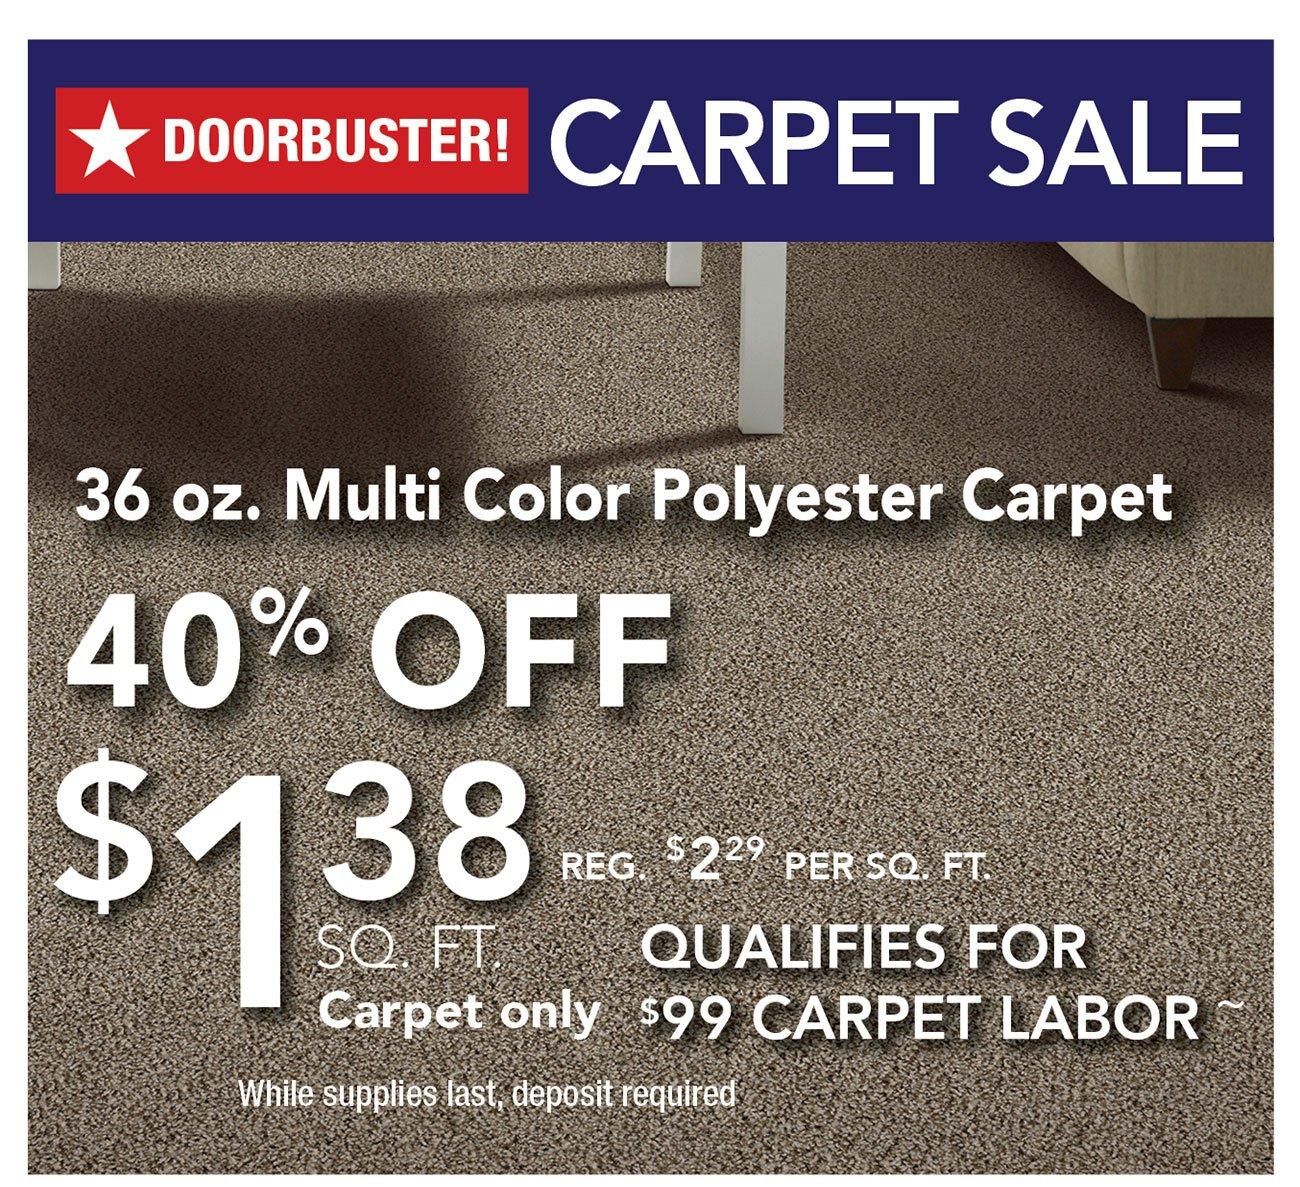 carpet-sale